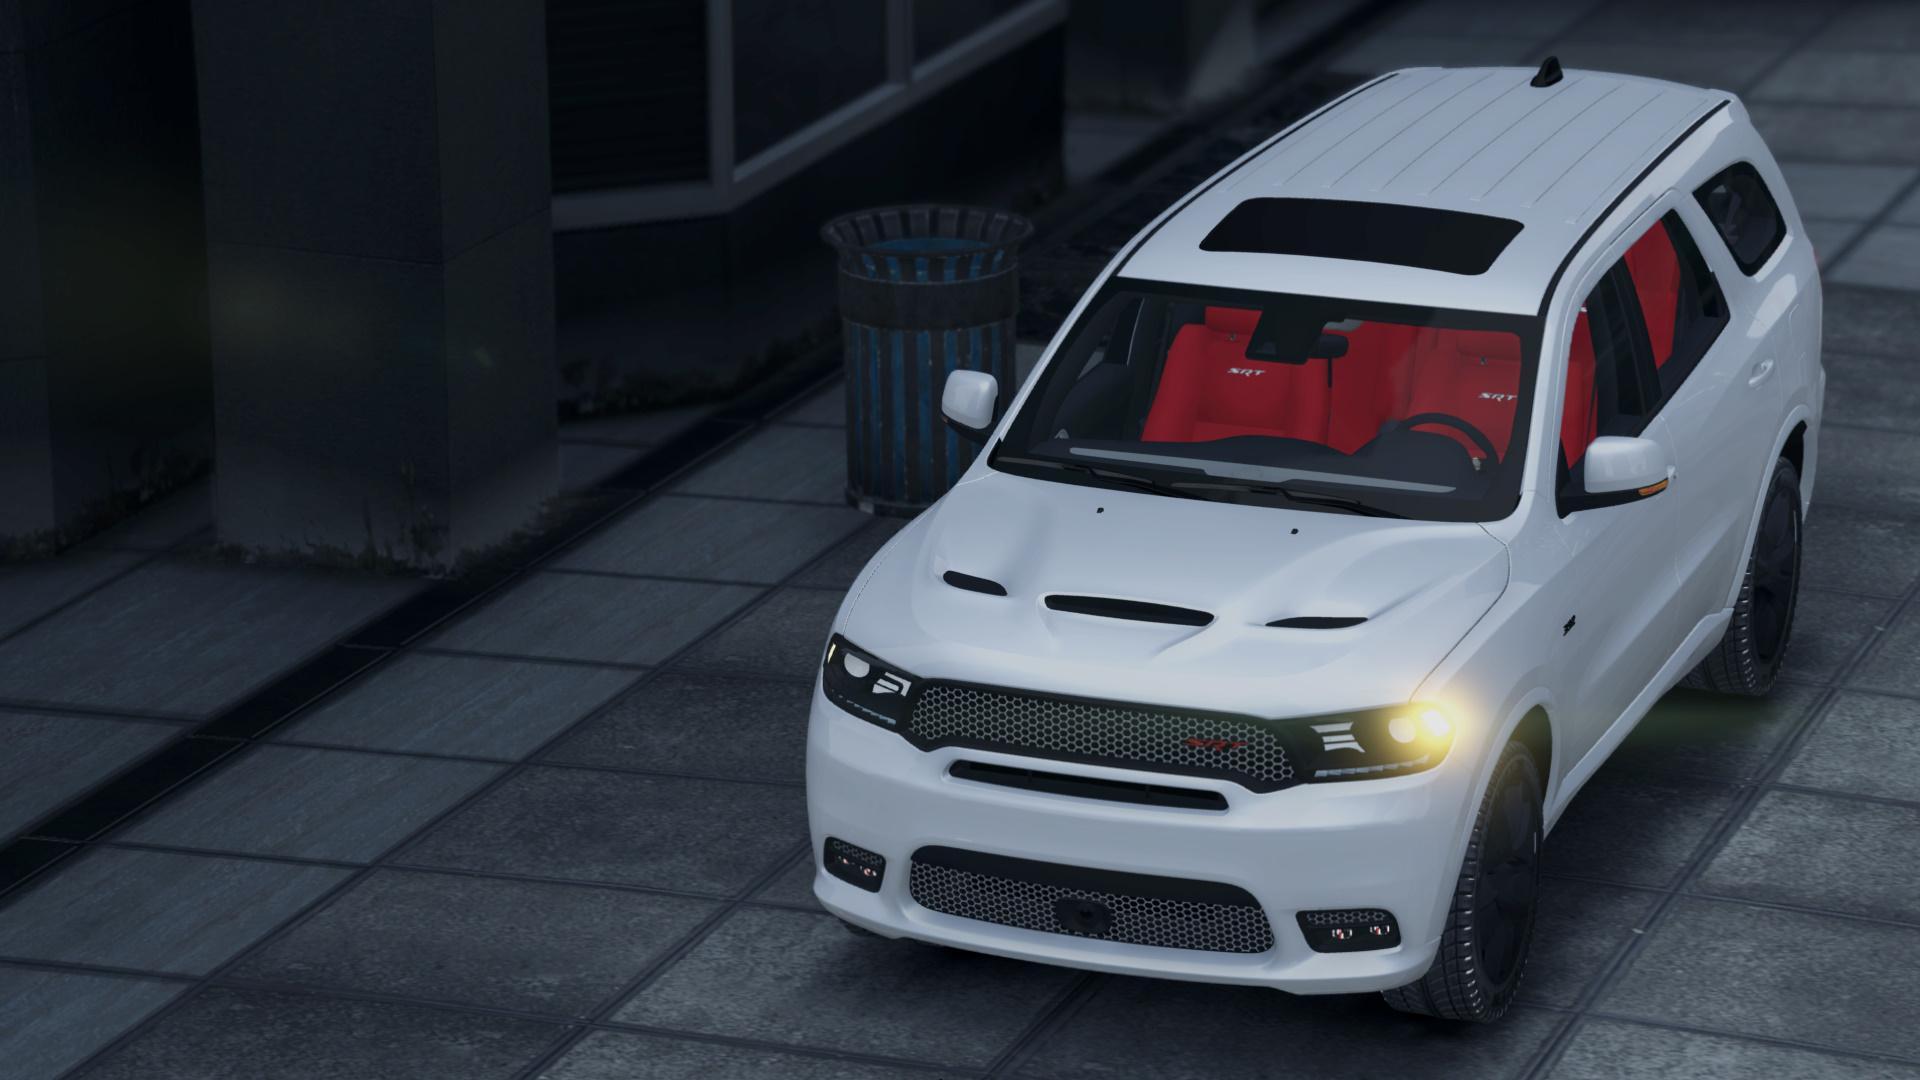 2018 Dodge Durango SRT [Add-On / Replace] - GTA5-Mods.com